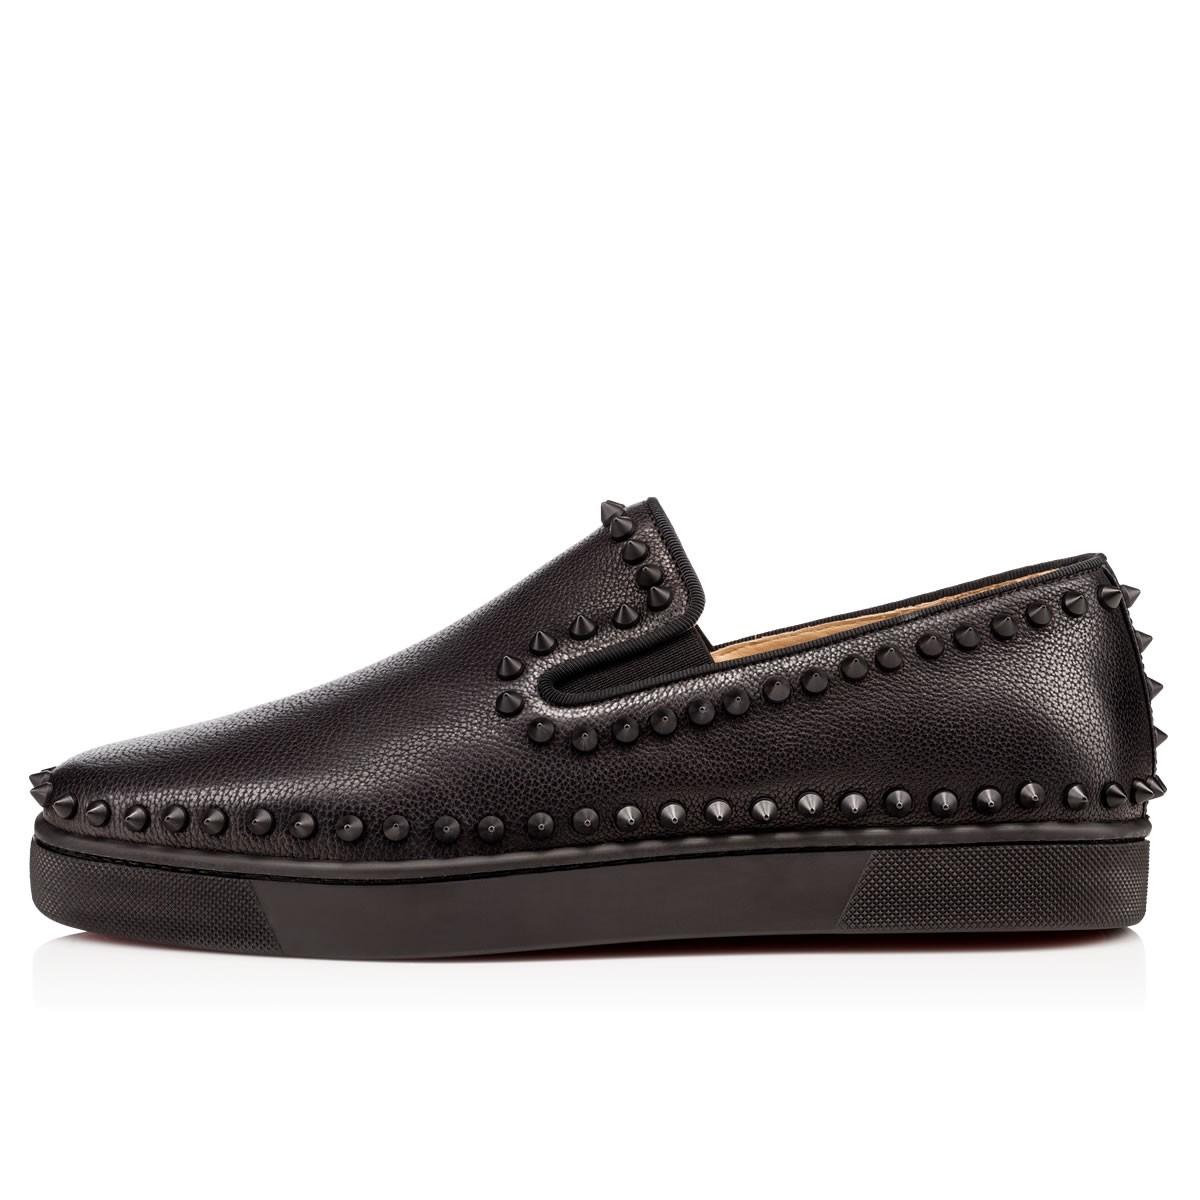 shoe replicas - Artesur ? christian louboutin Pik Boat Flat Sneakers black matted ...